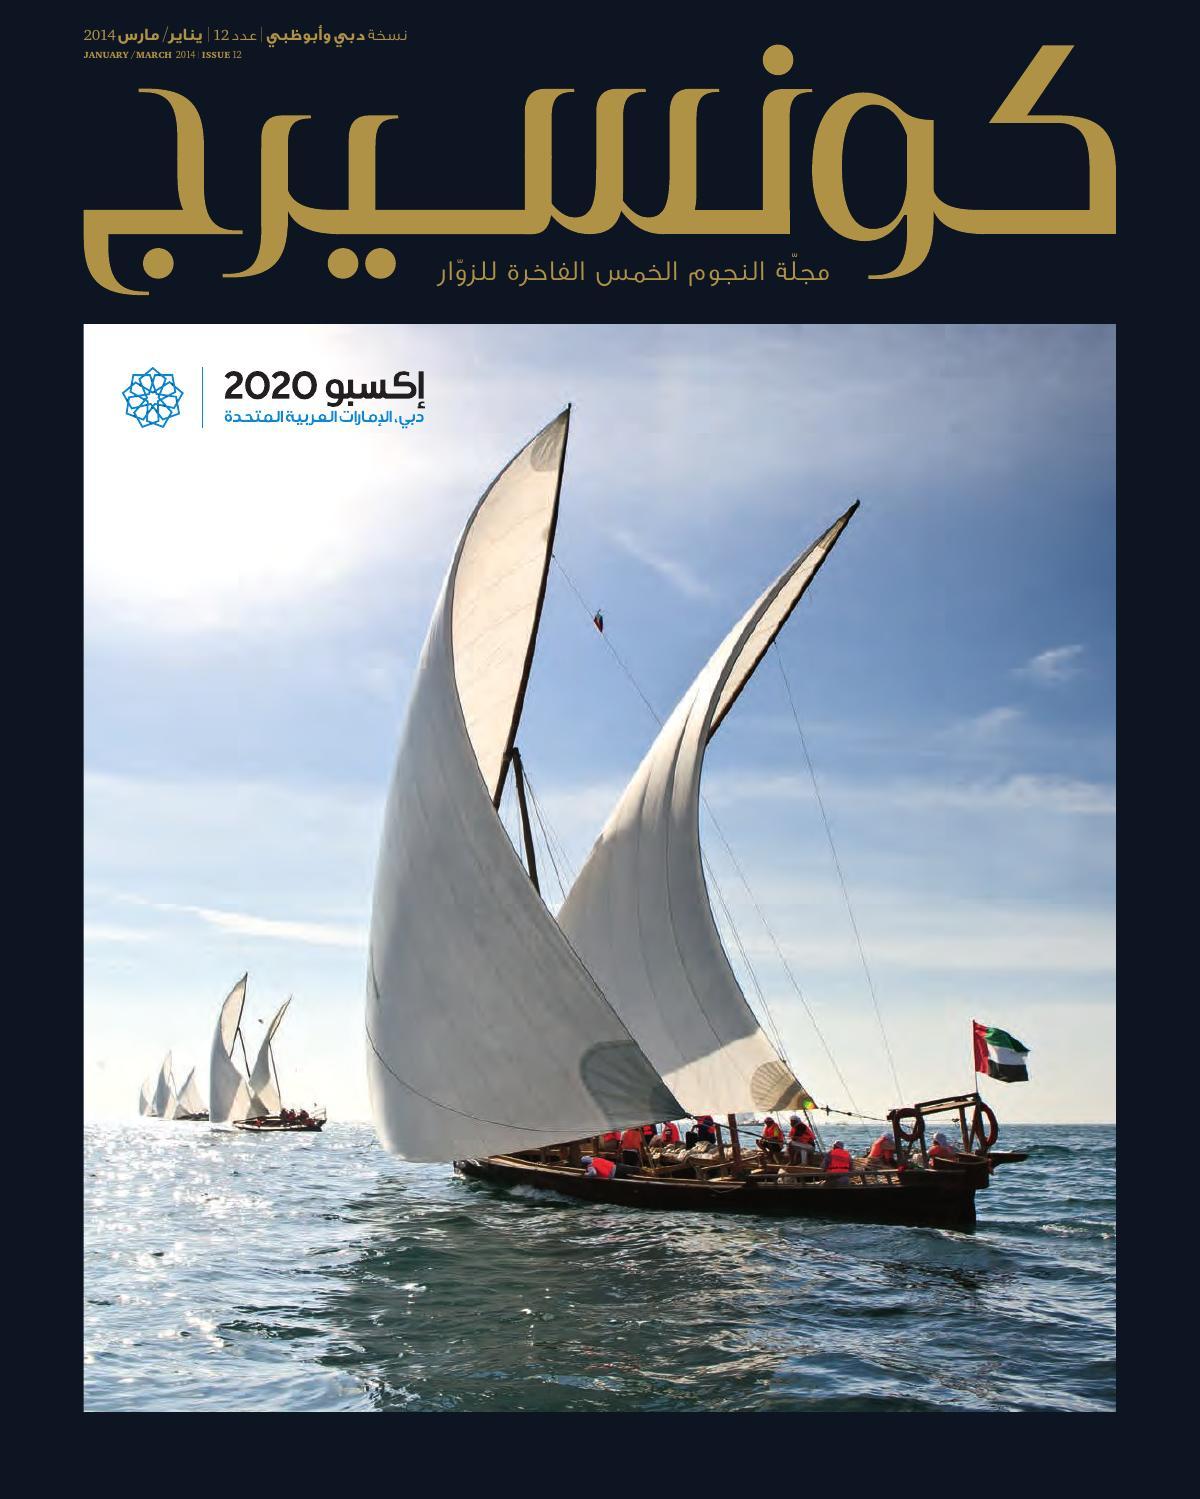 5d48fdcac Concierge Arabic Jan 2014 by npimedia fz llc - issuu